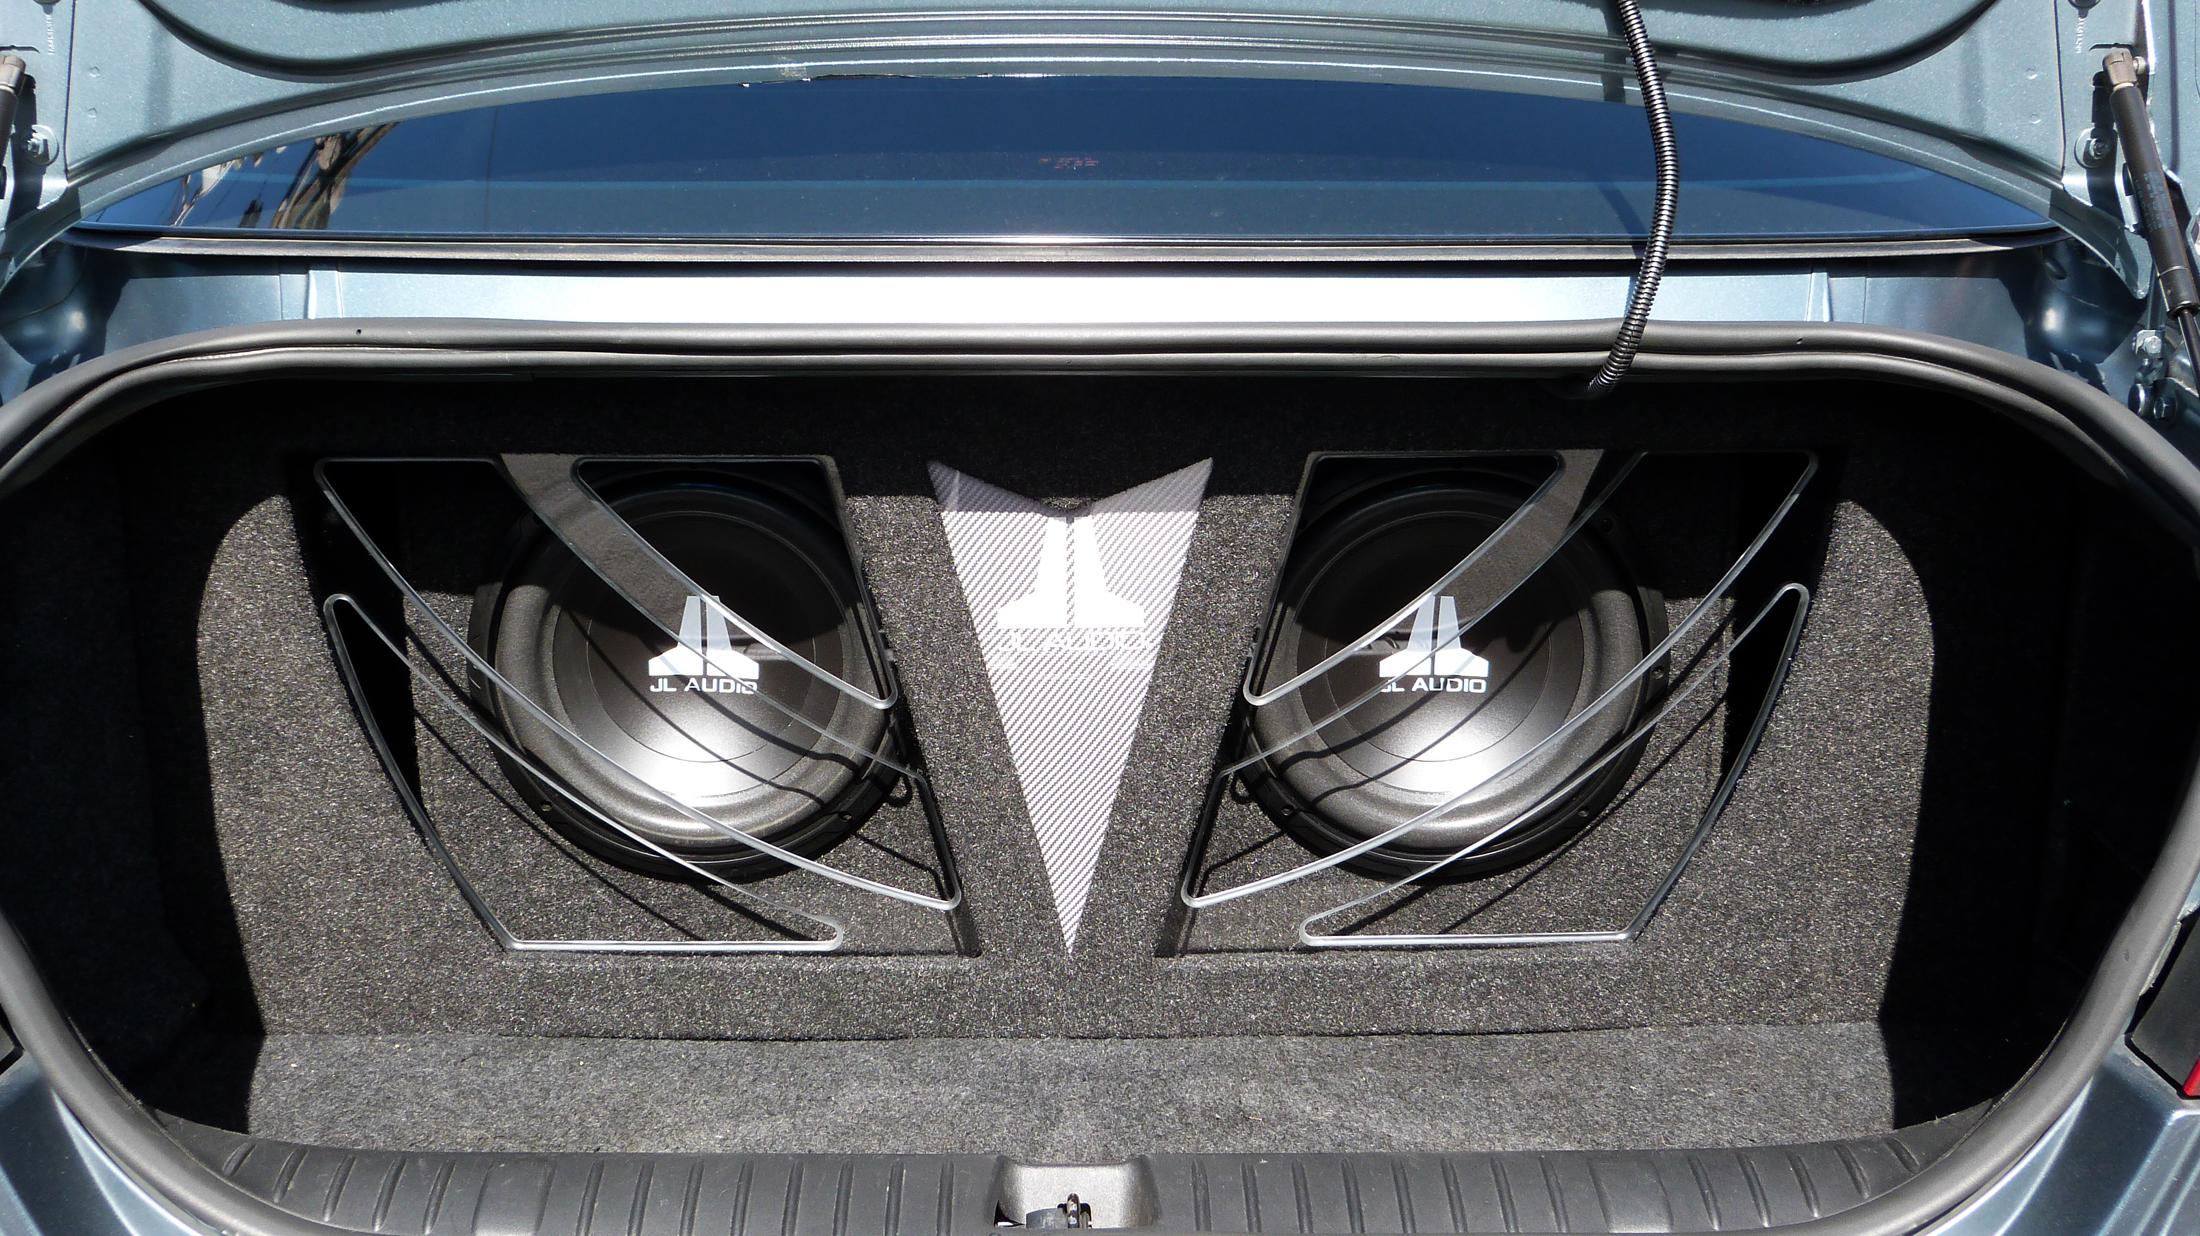 Santa Fe Bmw >> Pontiac Grand Prix | Santa Fe Auto Sound